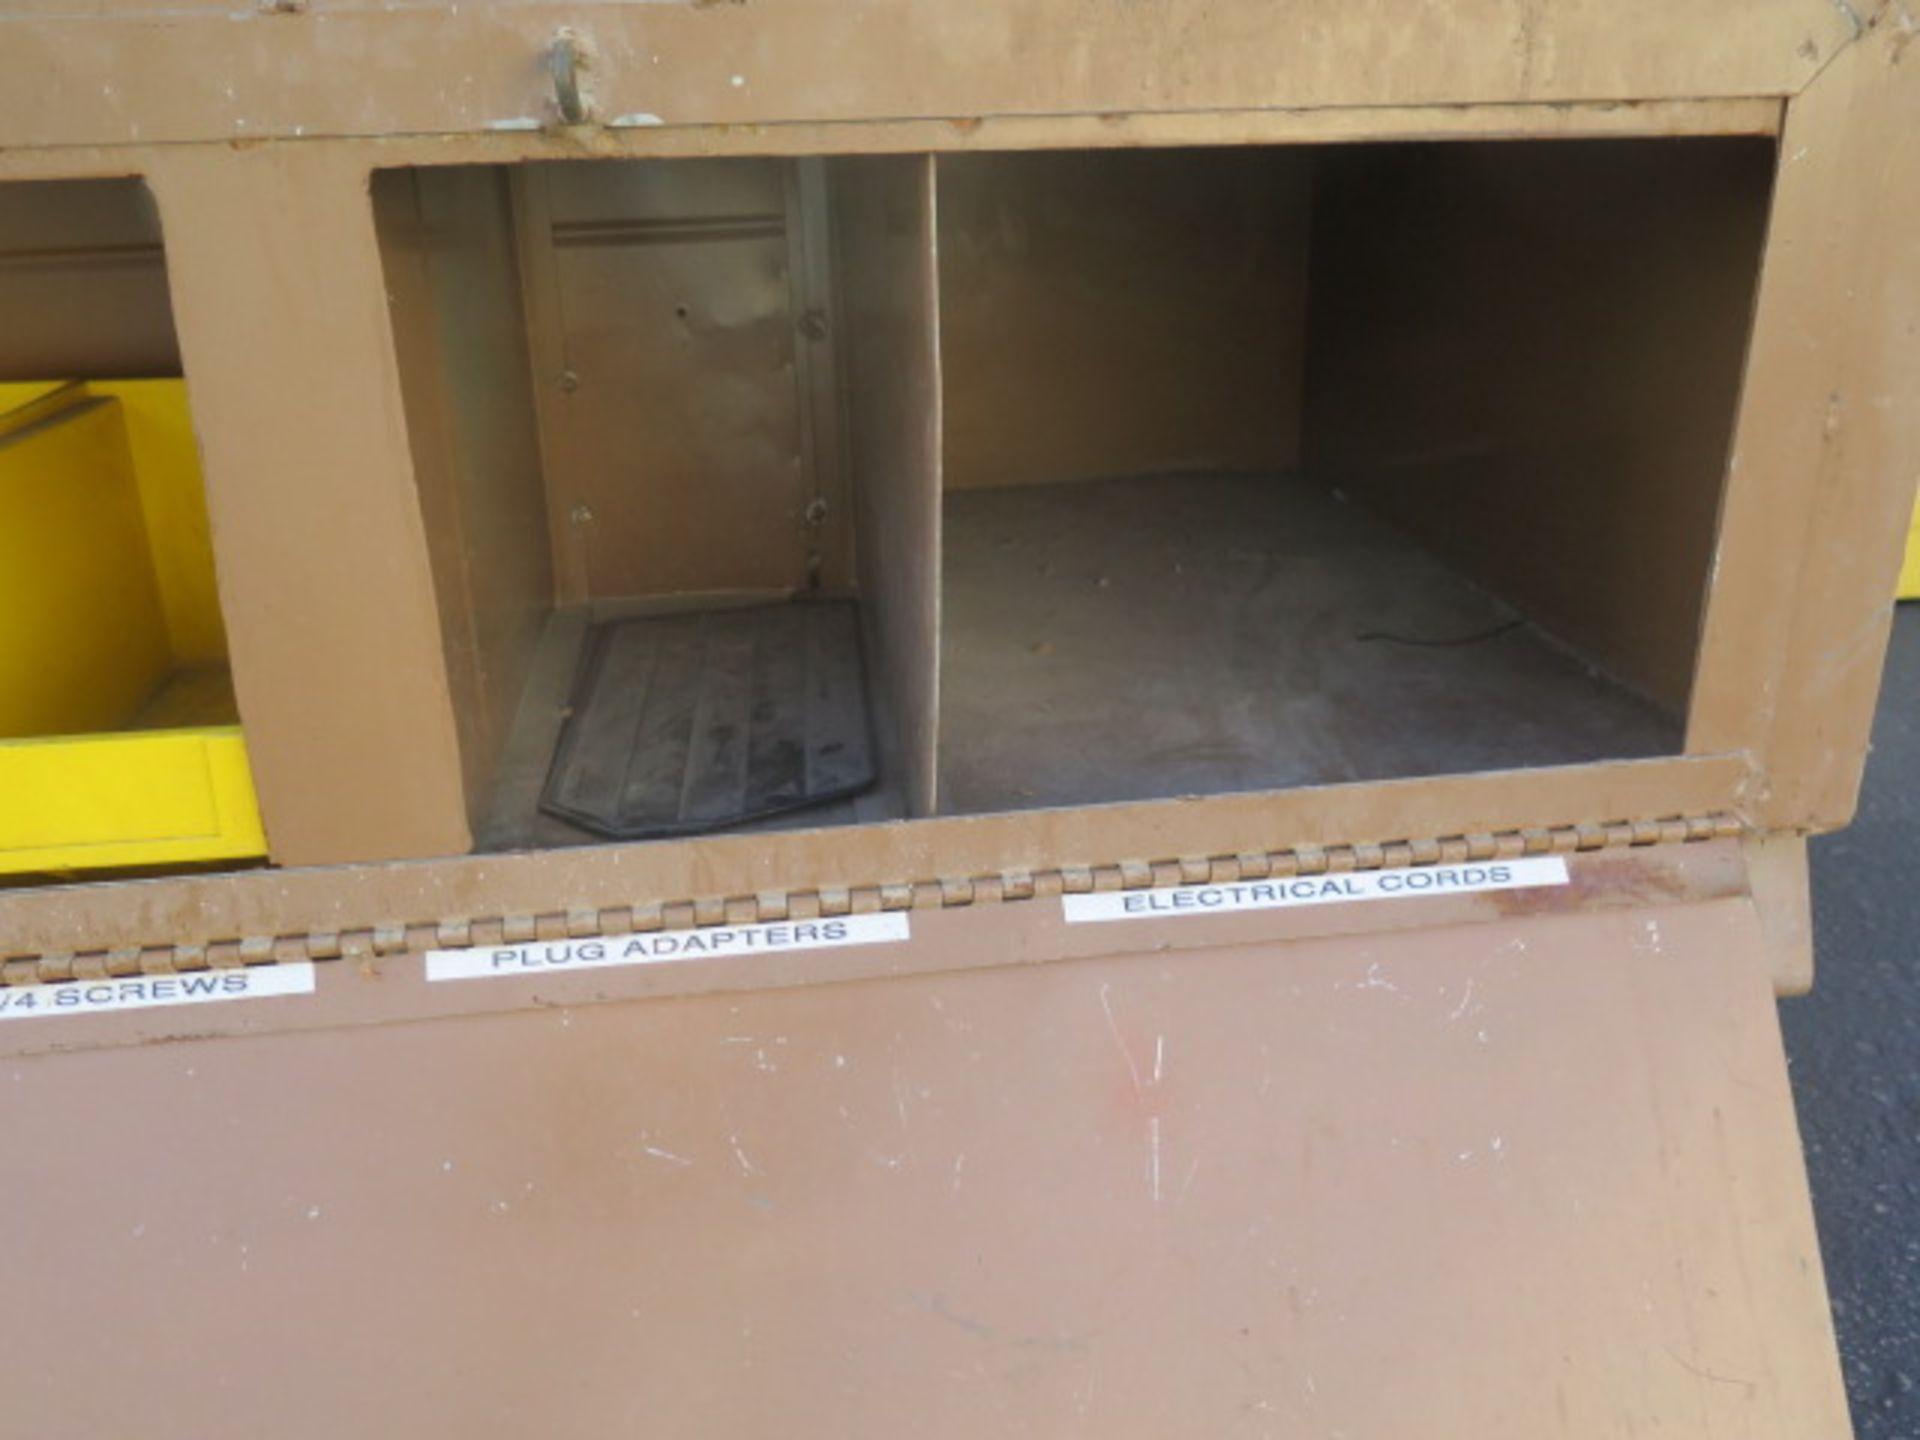 Knaack mdl. 89 Storagemaster Rolling Job Box (SOLD AS-IS - NO WARRANTY) - Image 9 of 12